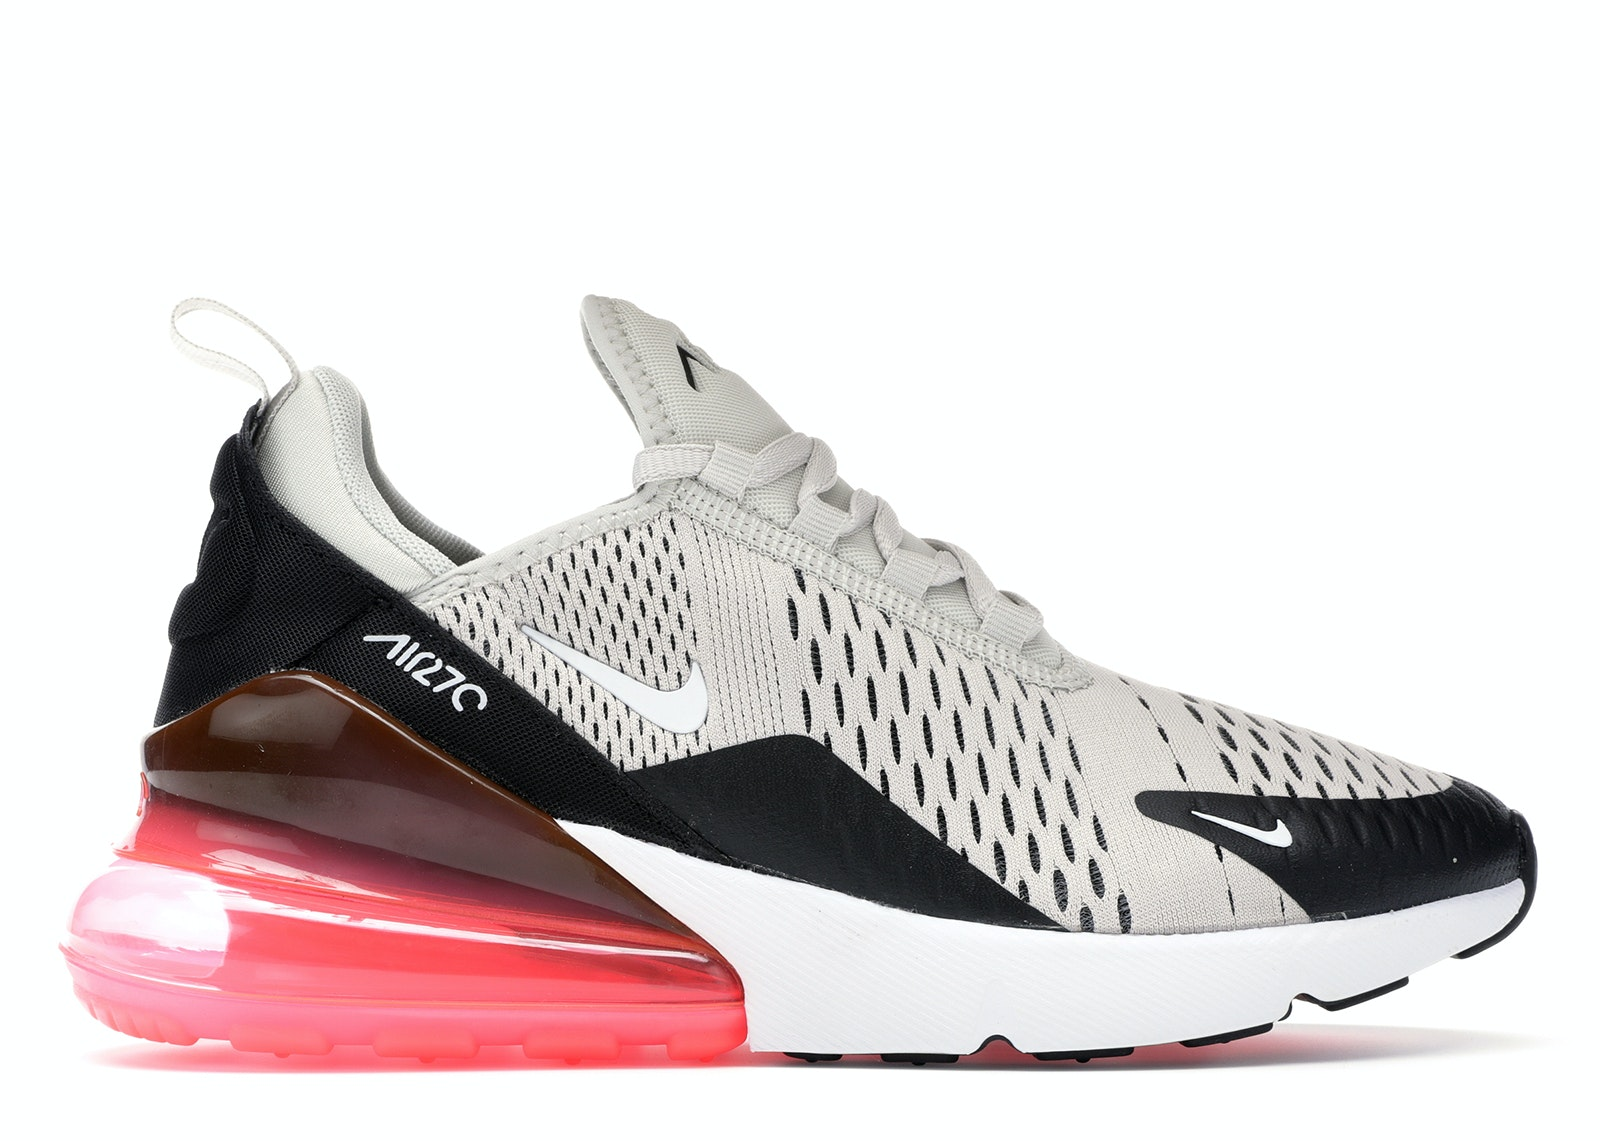 Air Max 270 Gs Black Ember Nike 943345 013 Goat